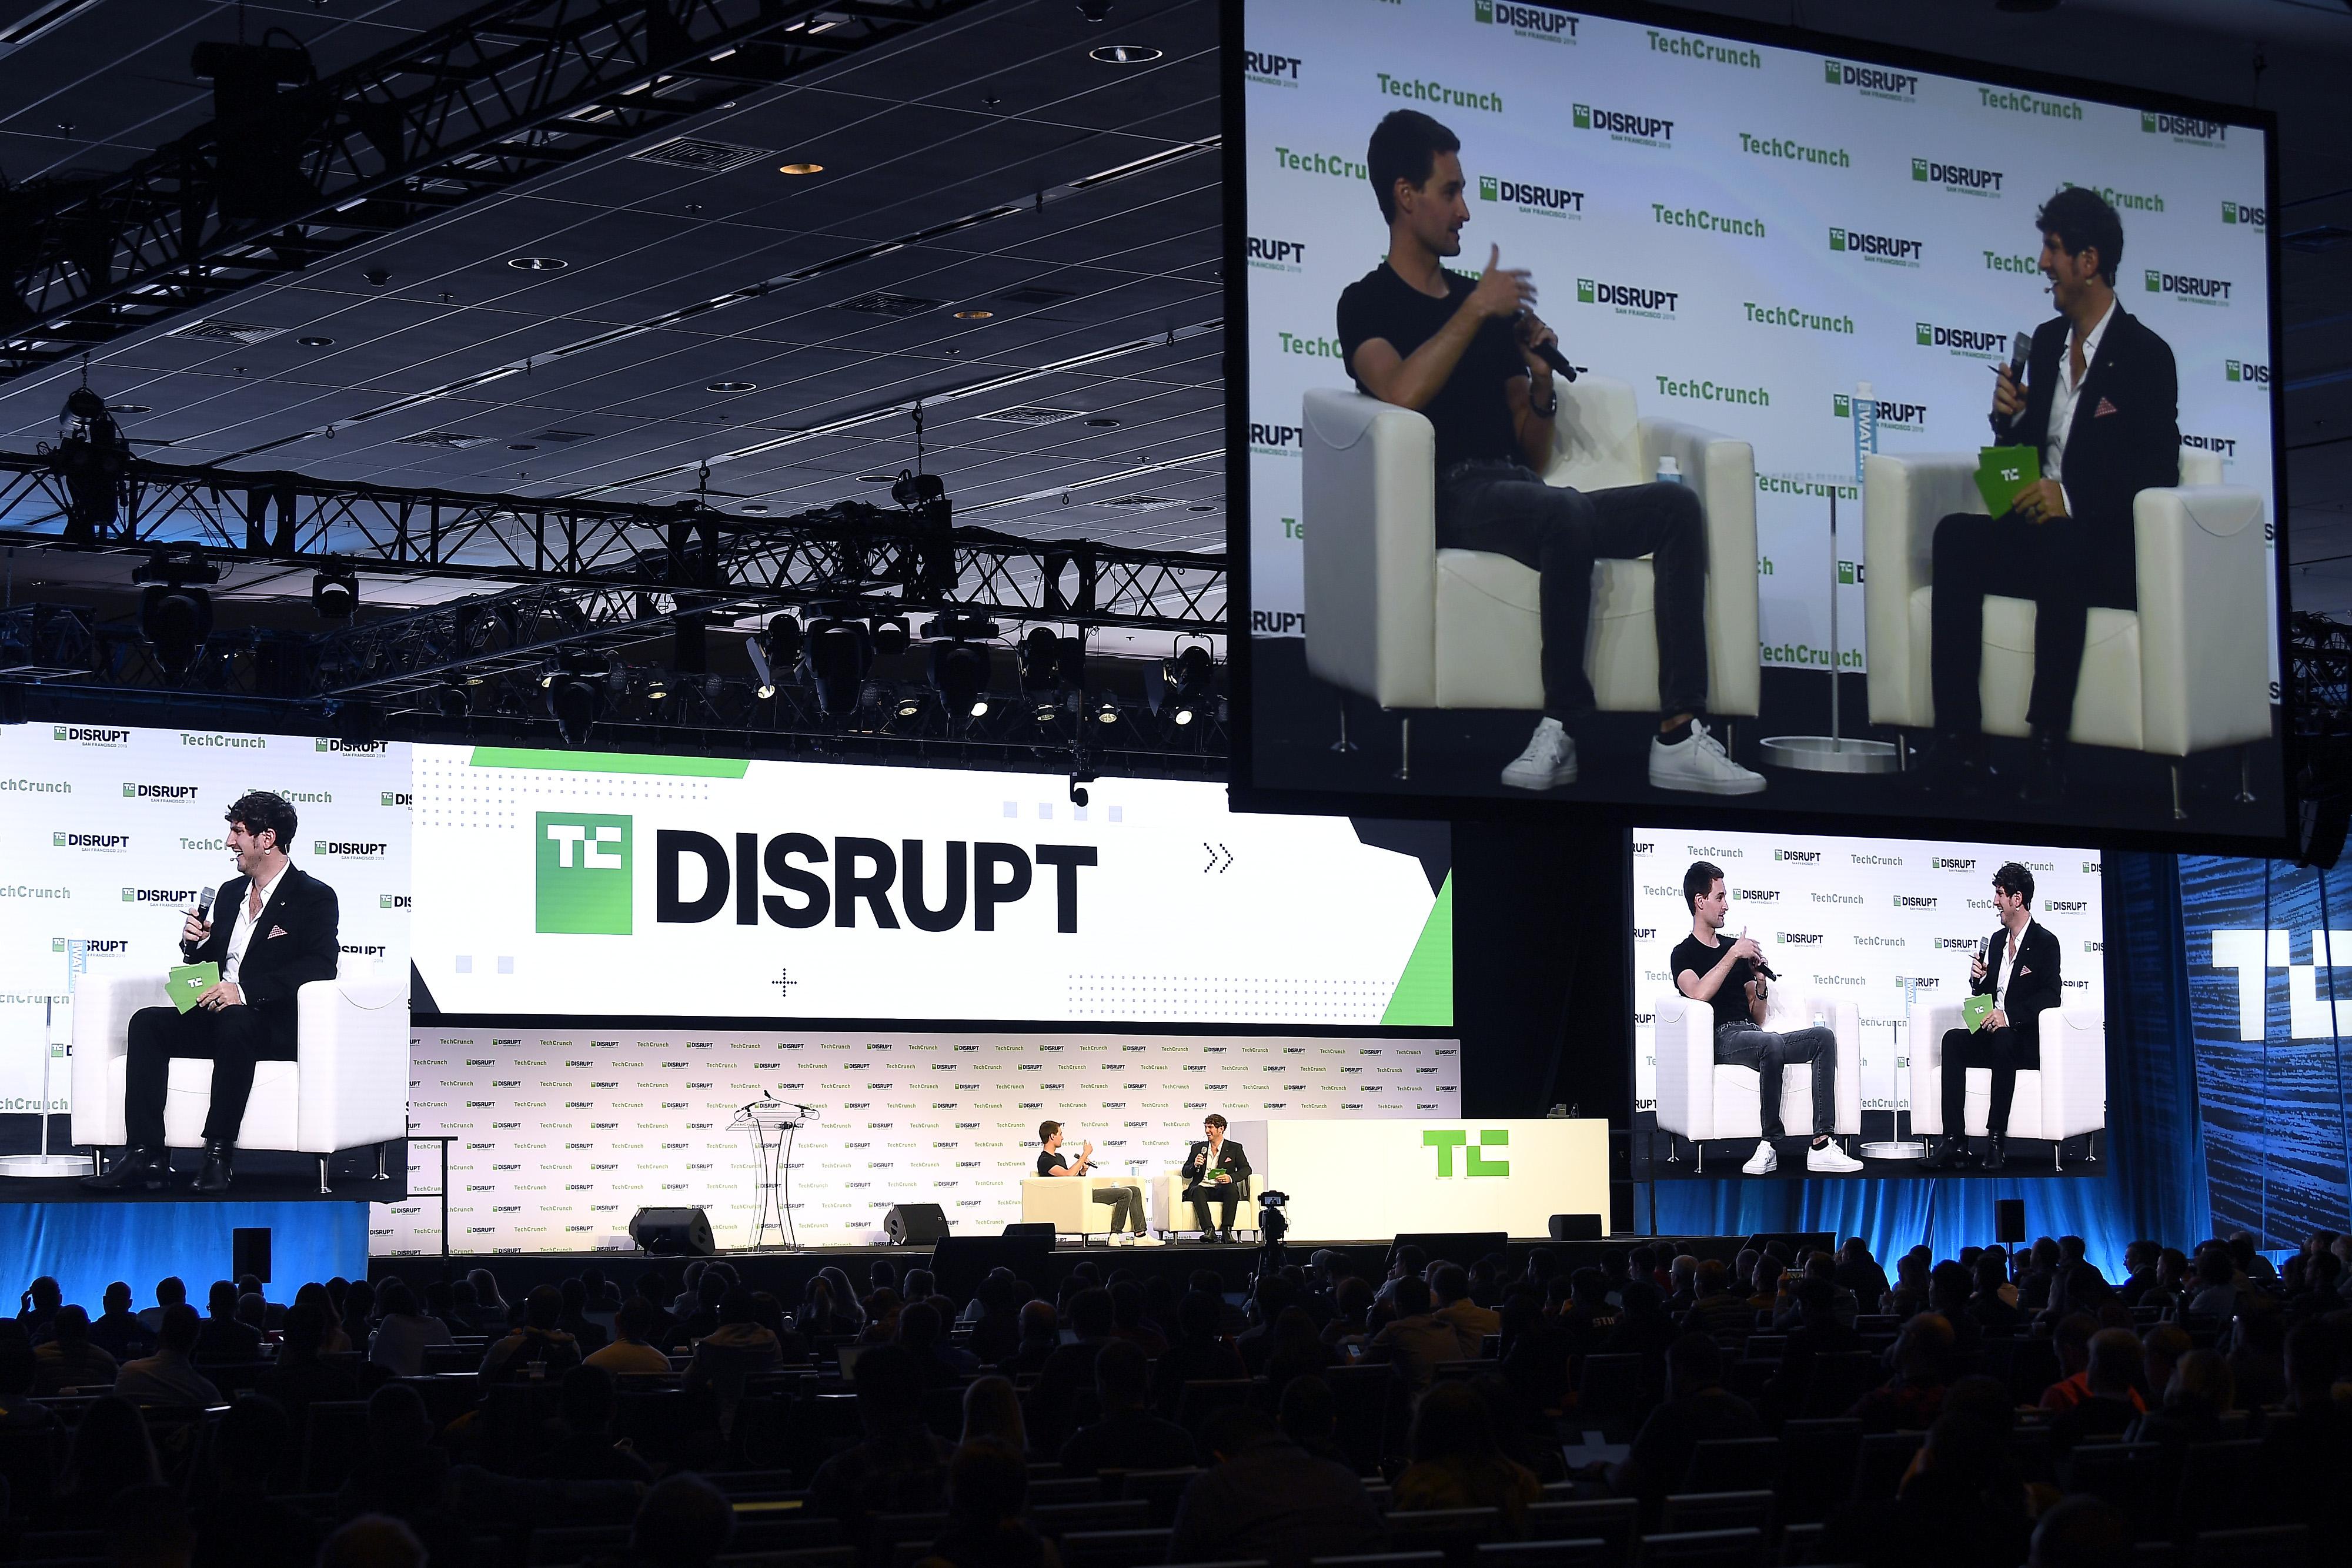 https://techcrunch.com/wp-content/uploads/2020/04/Josh-Evan-Spiegel-Disrupt-2019-Wide.jpg